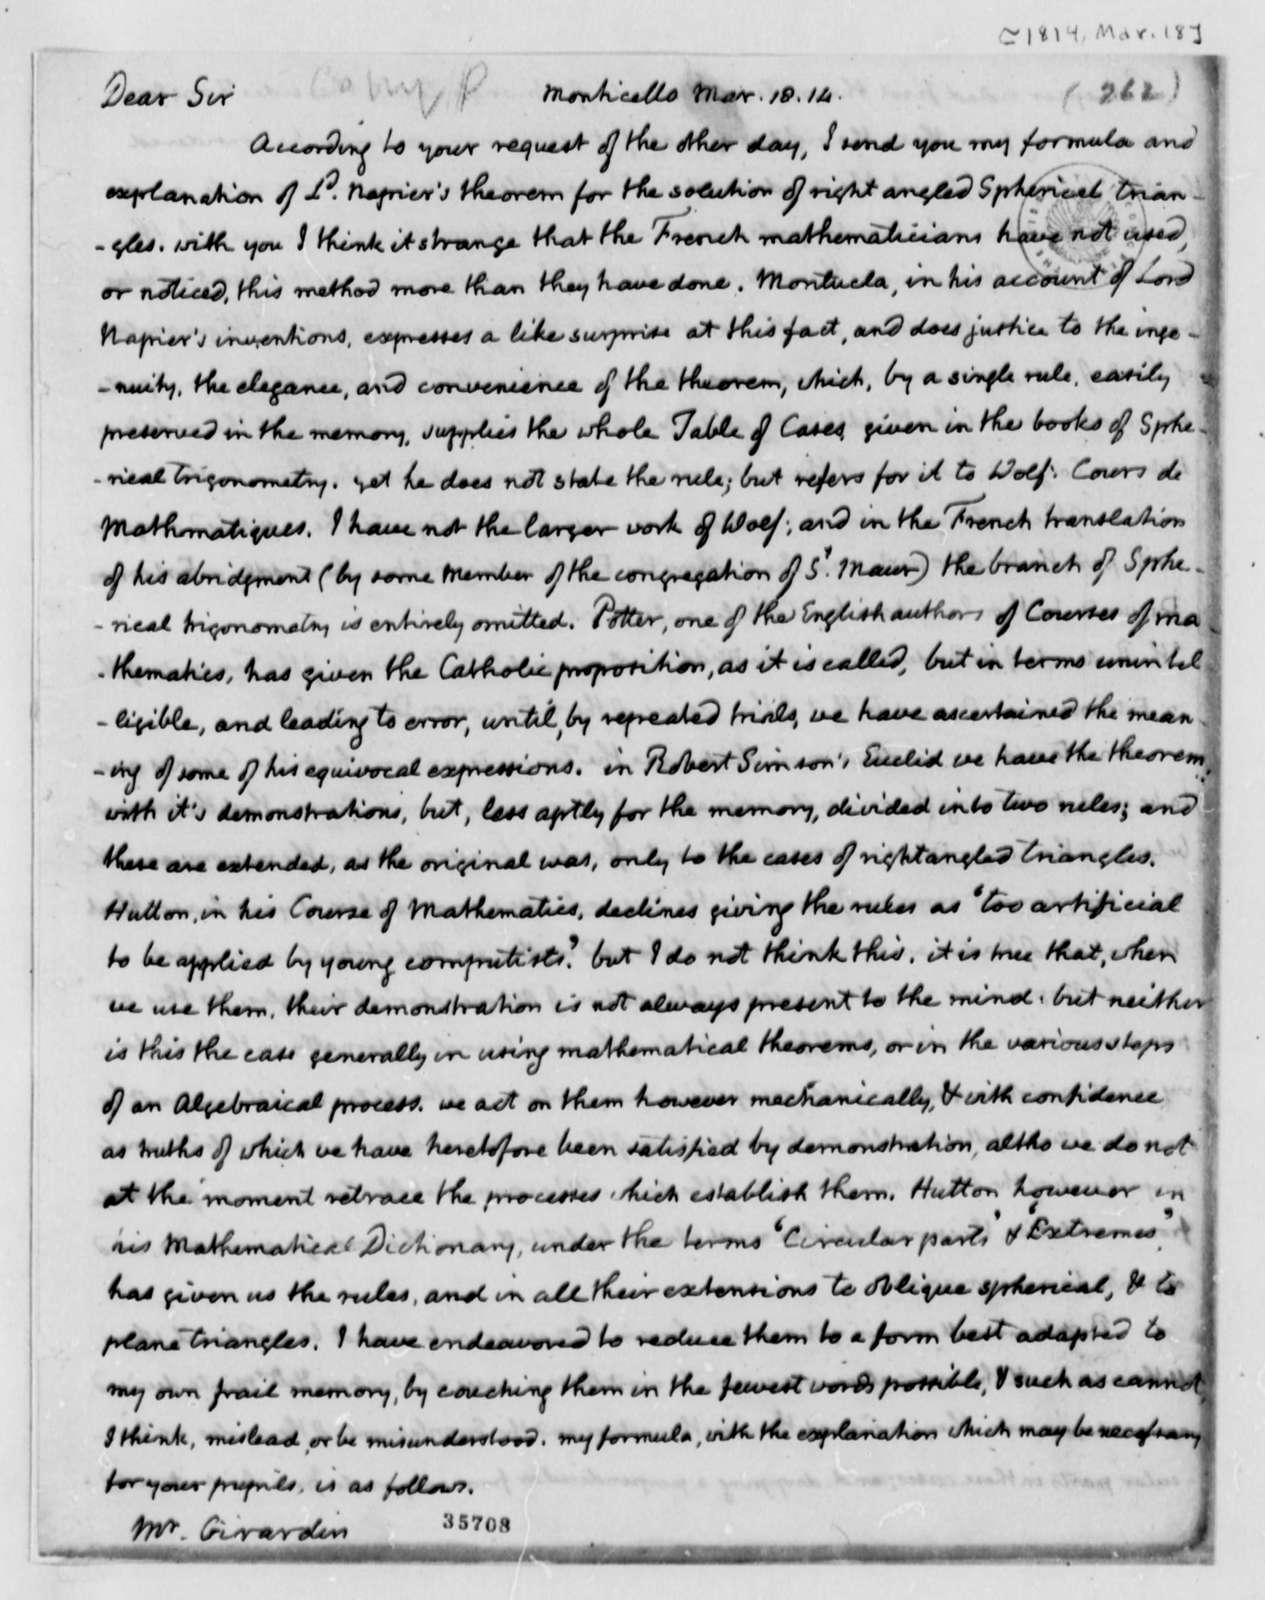 Thomas Jefferson to Louis H. Girardin, March 18, 1814